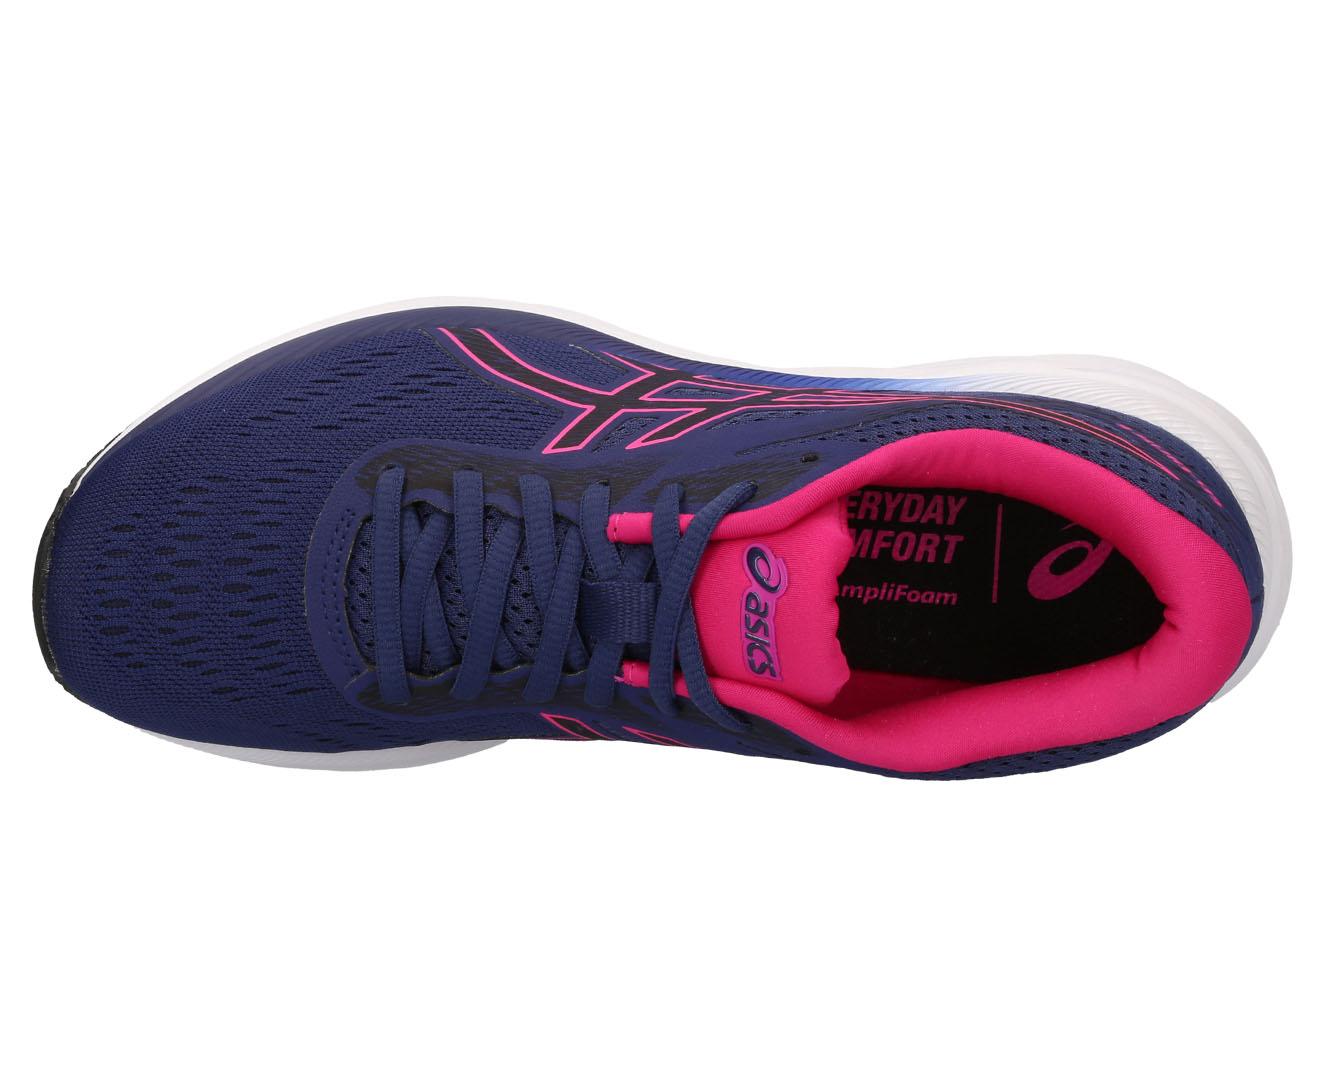 Bluepink Excite Shoe Gel Indigo Asics Raveau Women's 6 ARL5j43q